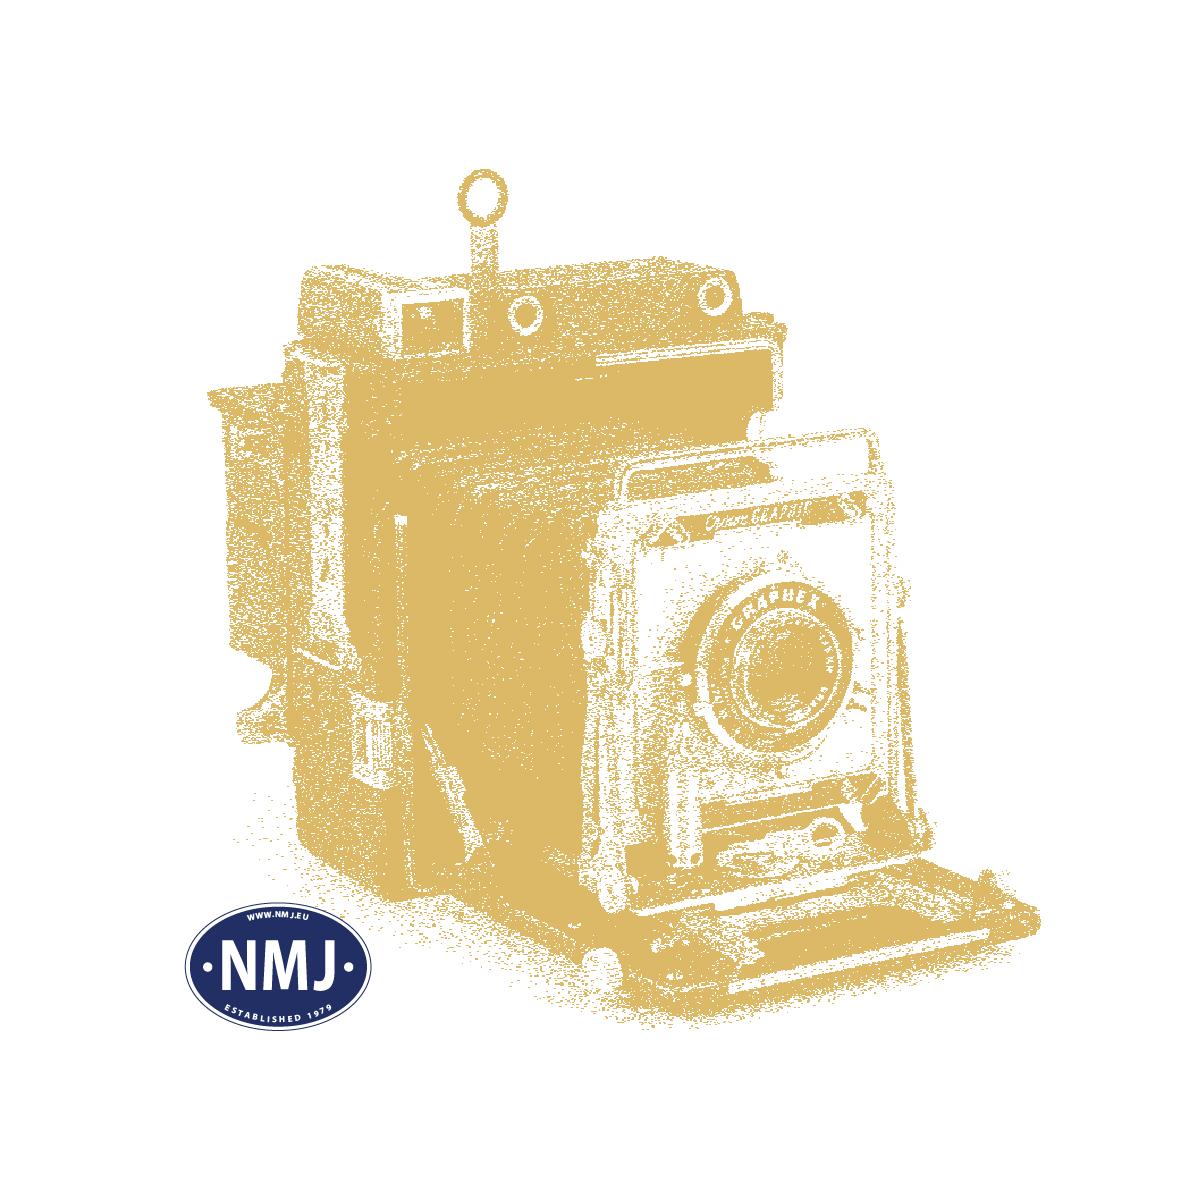 NMJ0G4-8 - NMJ Superline NSB Iblps 20 76 805 3013-7,, Spor 0